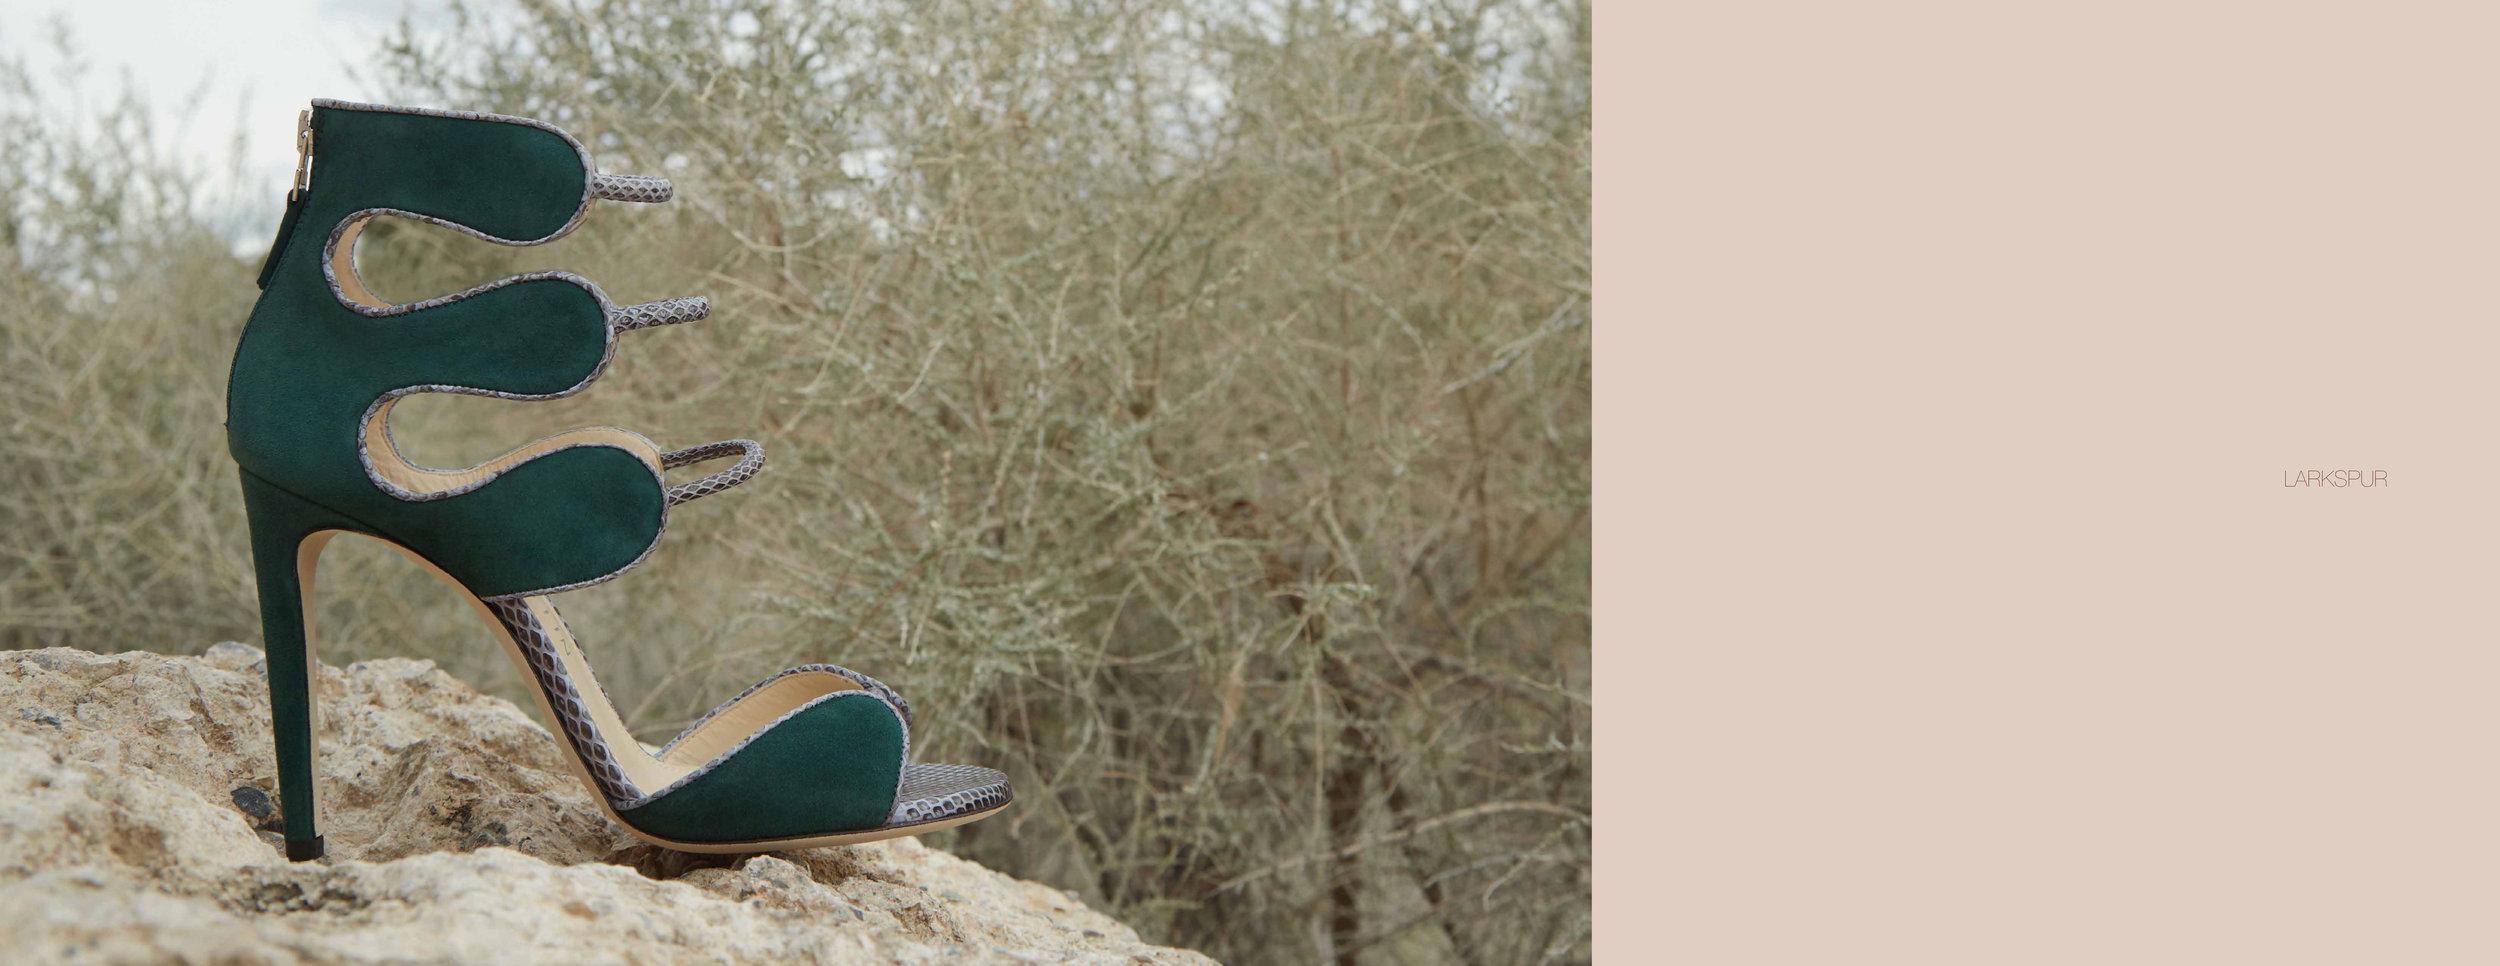 ChloeGosselin-FW17-lookbook1-13.jpg